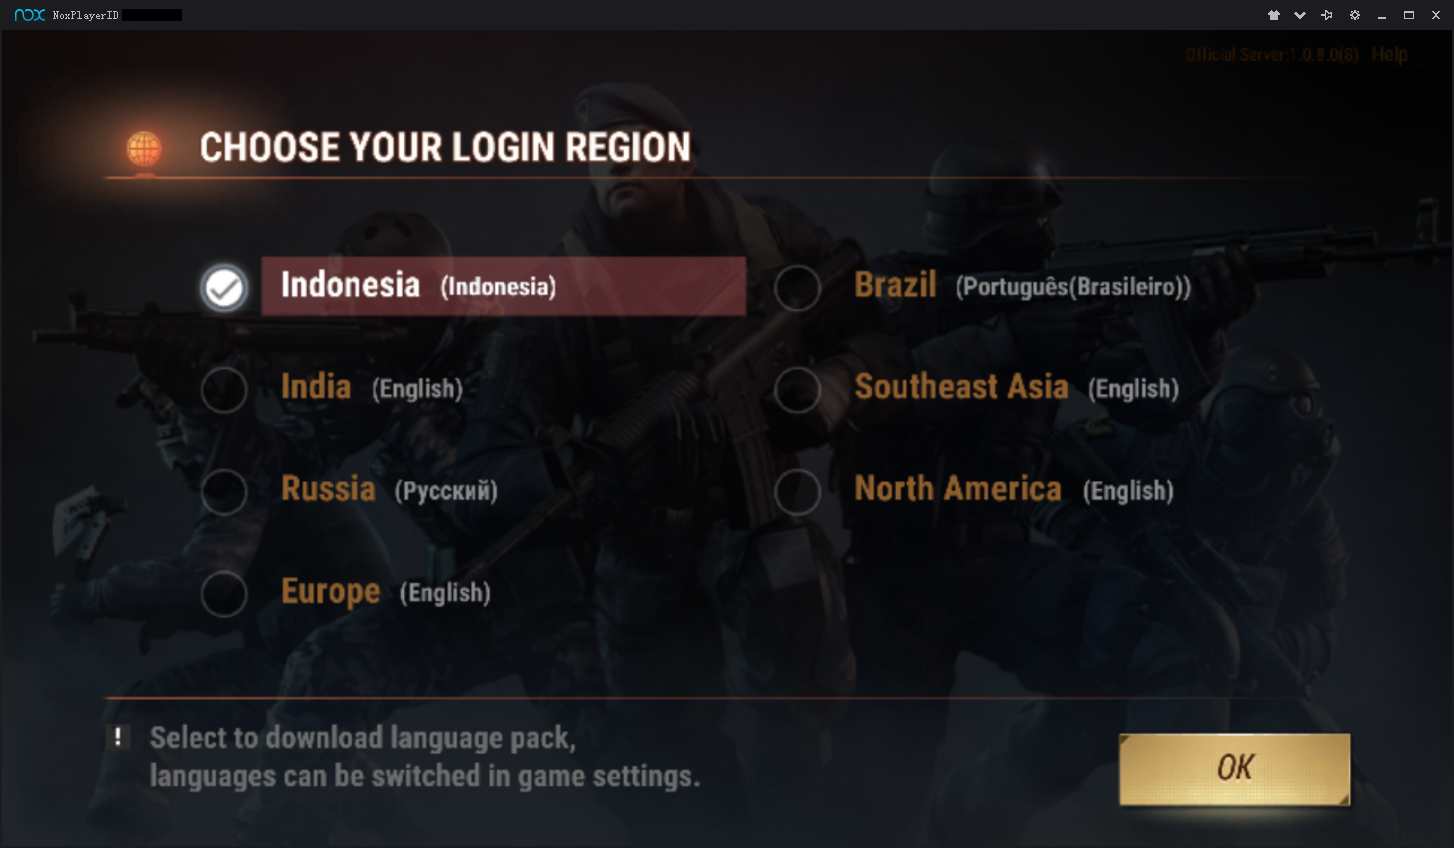 Cara Bermain Crossfire Legends Versi Pc Dengan Emulator